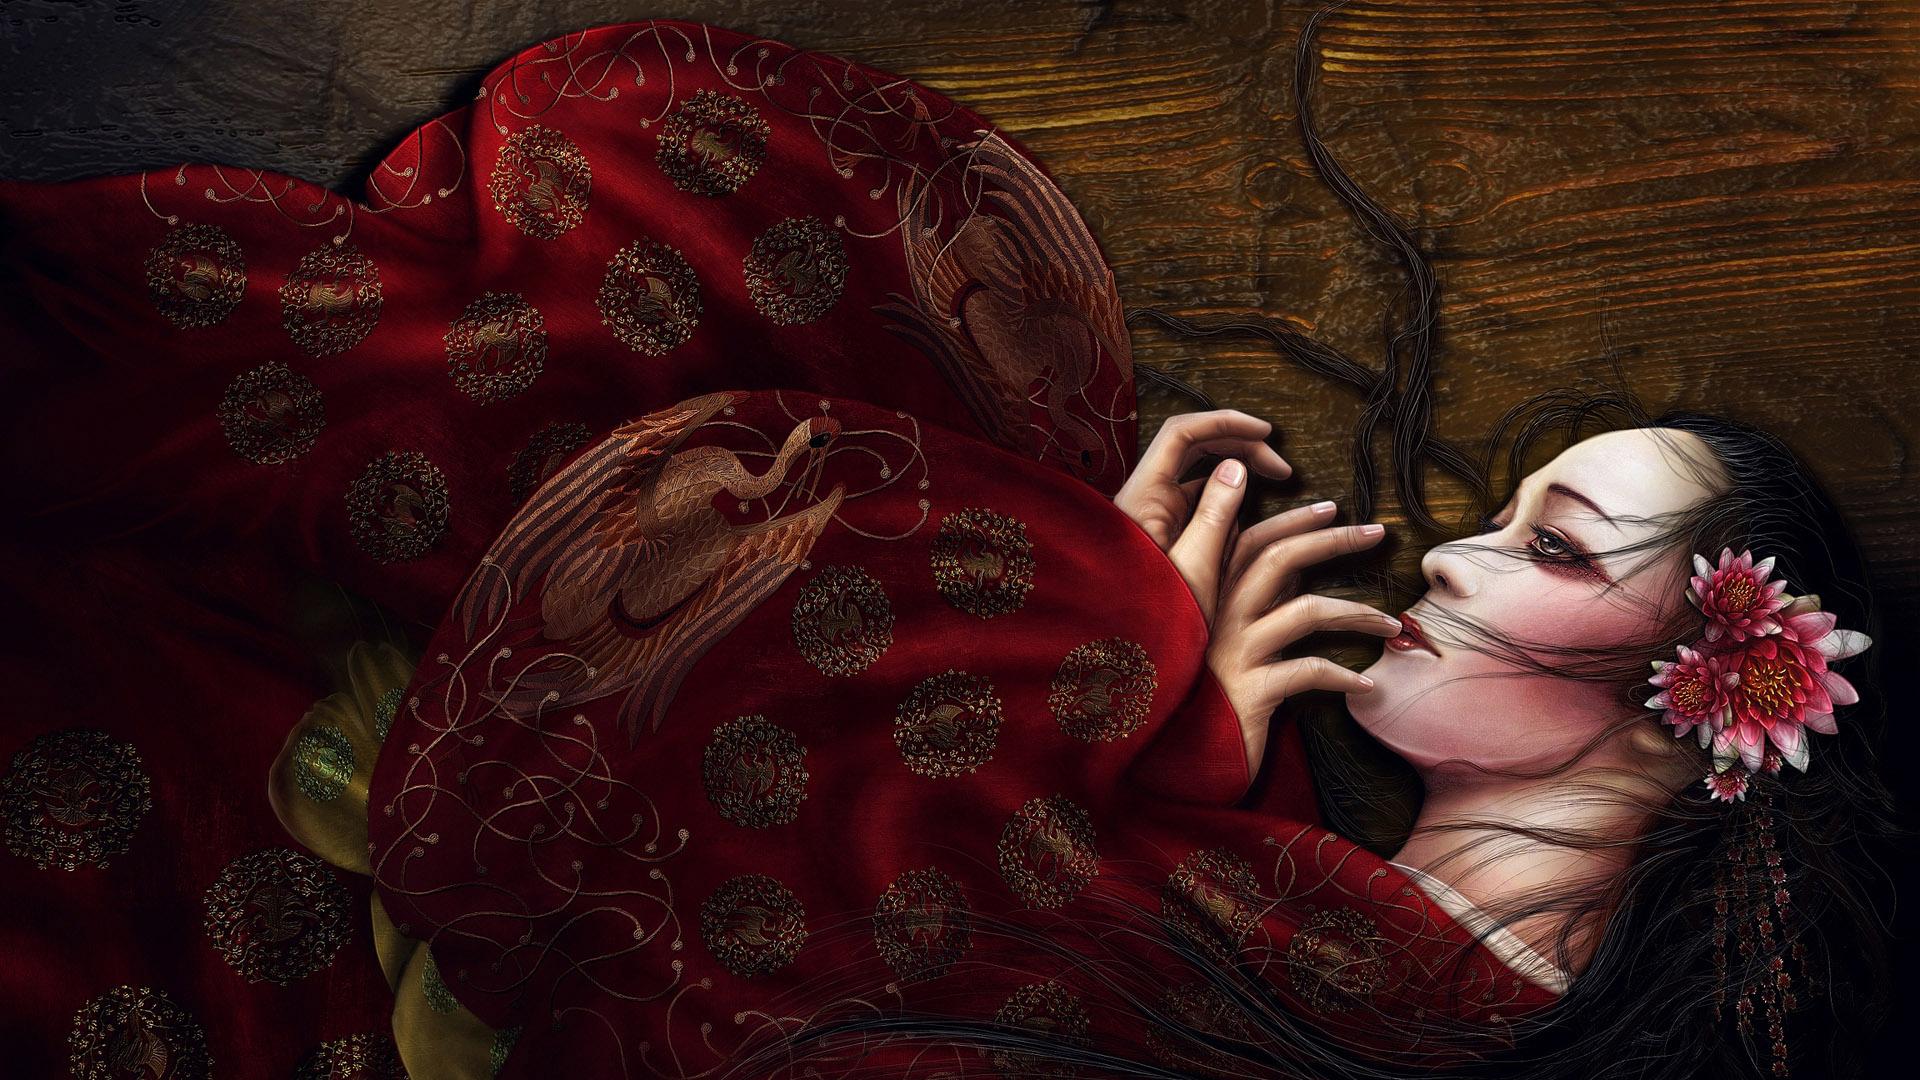 wallpaper geisha corals girl - photo #7